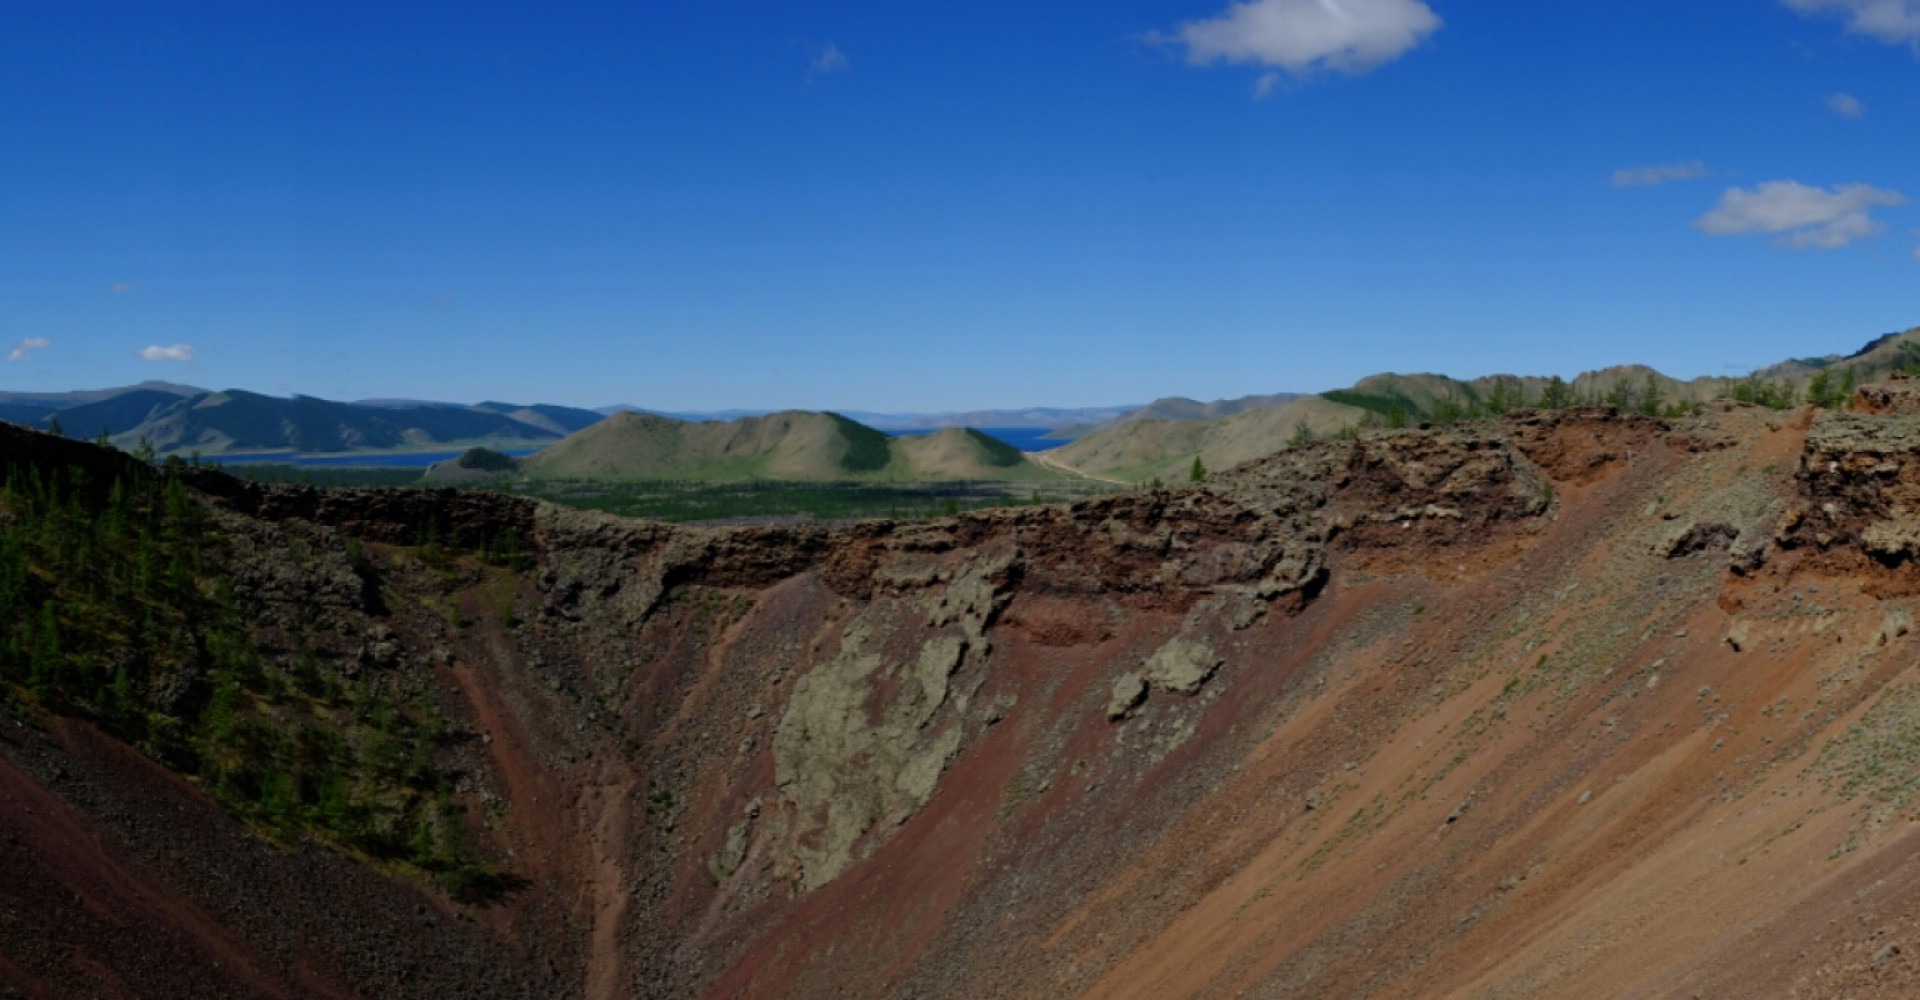 Khorgo Crater